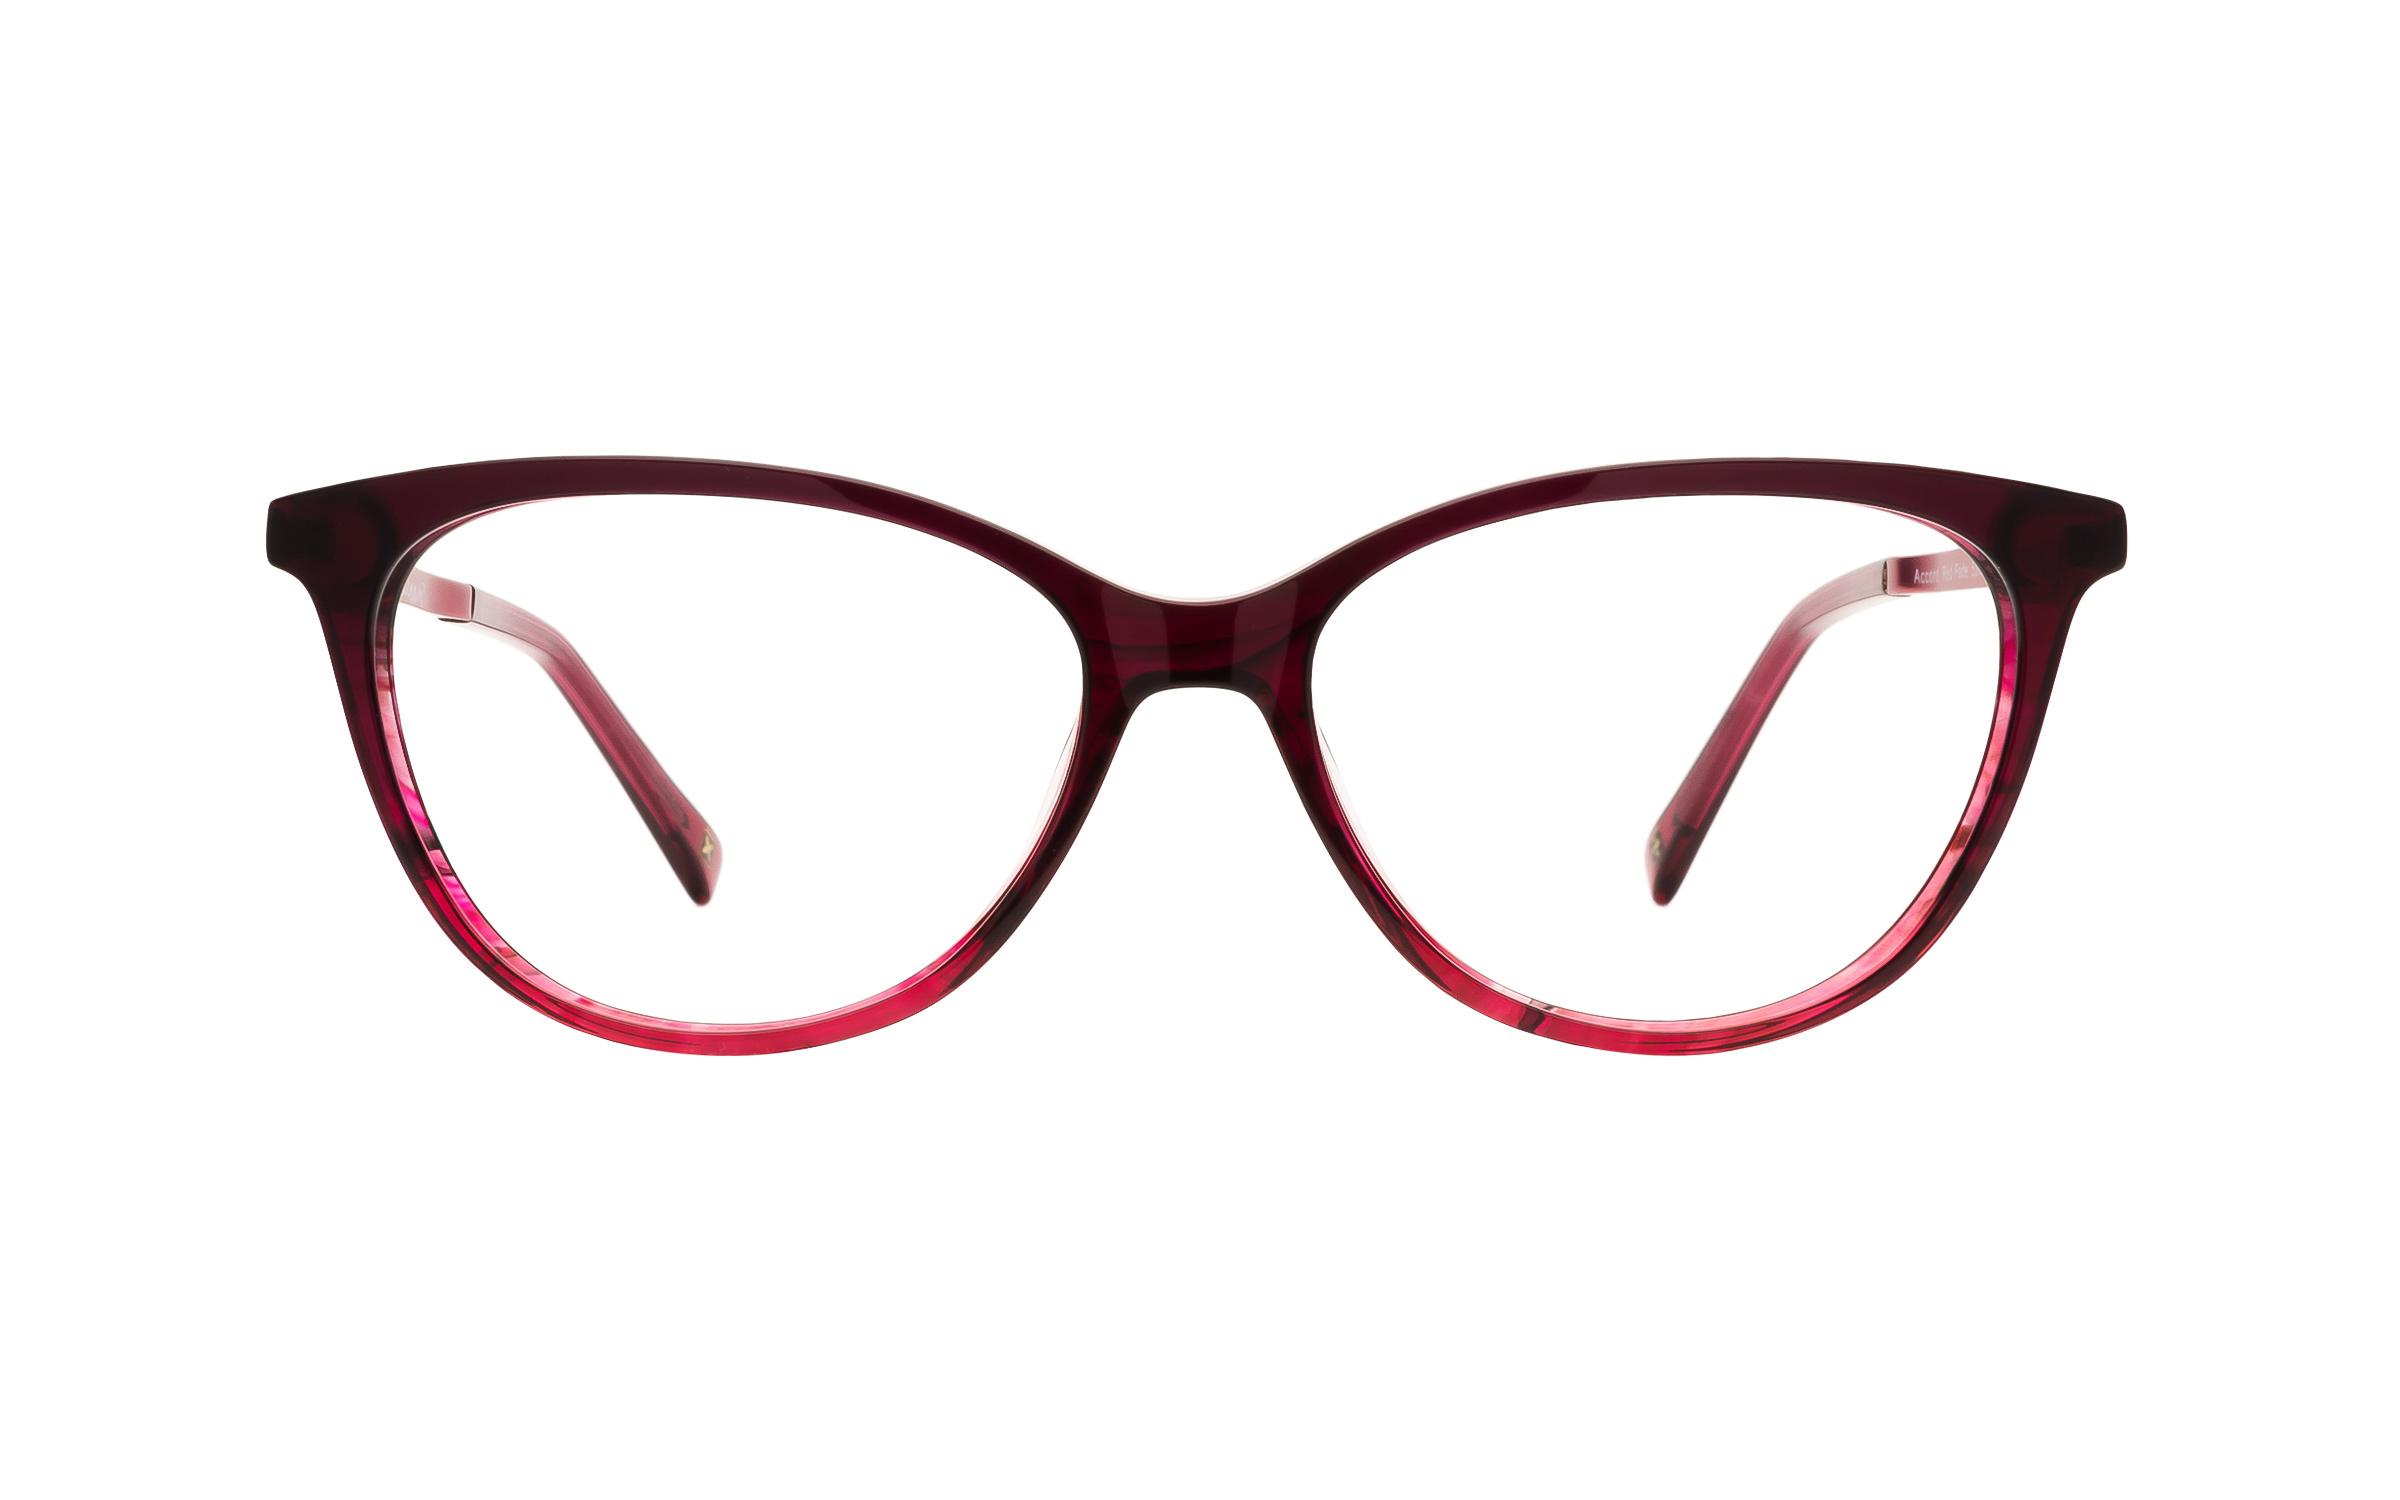 Women's Red Acetate/Metal Cat-Eye Derek Cardigan Glasses - Clearly Glasses Online